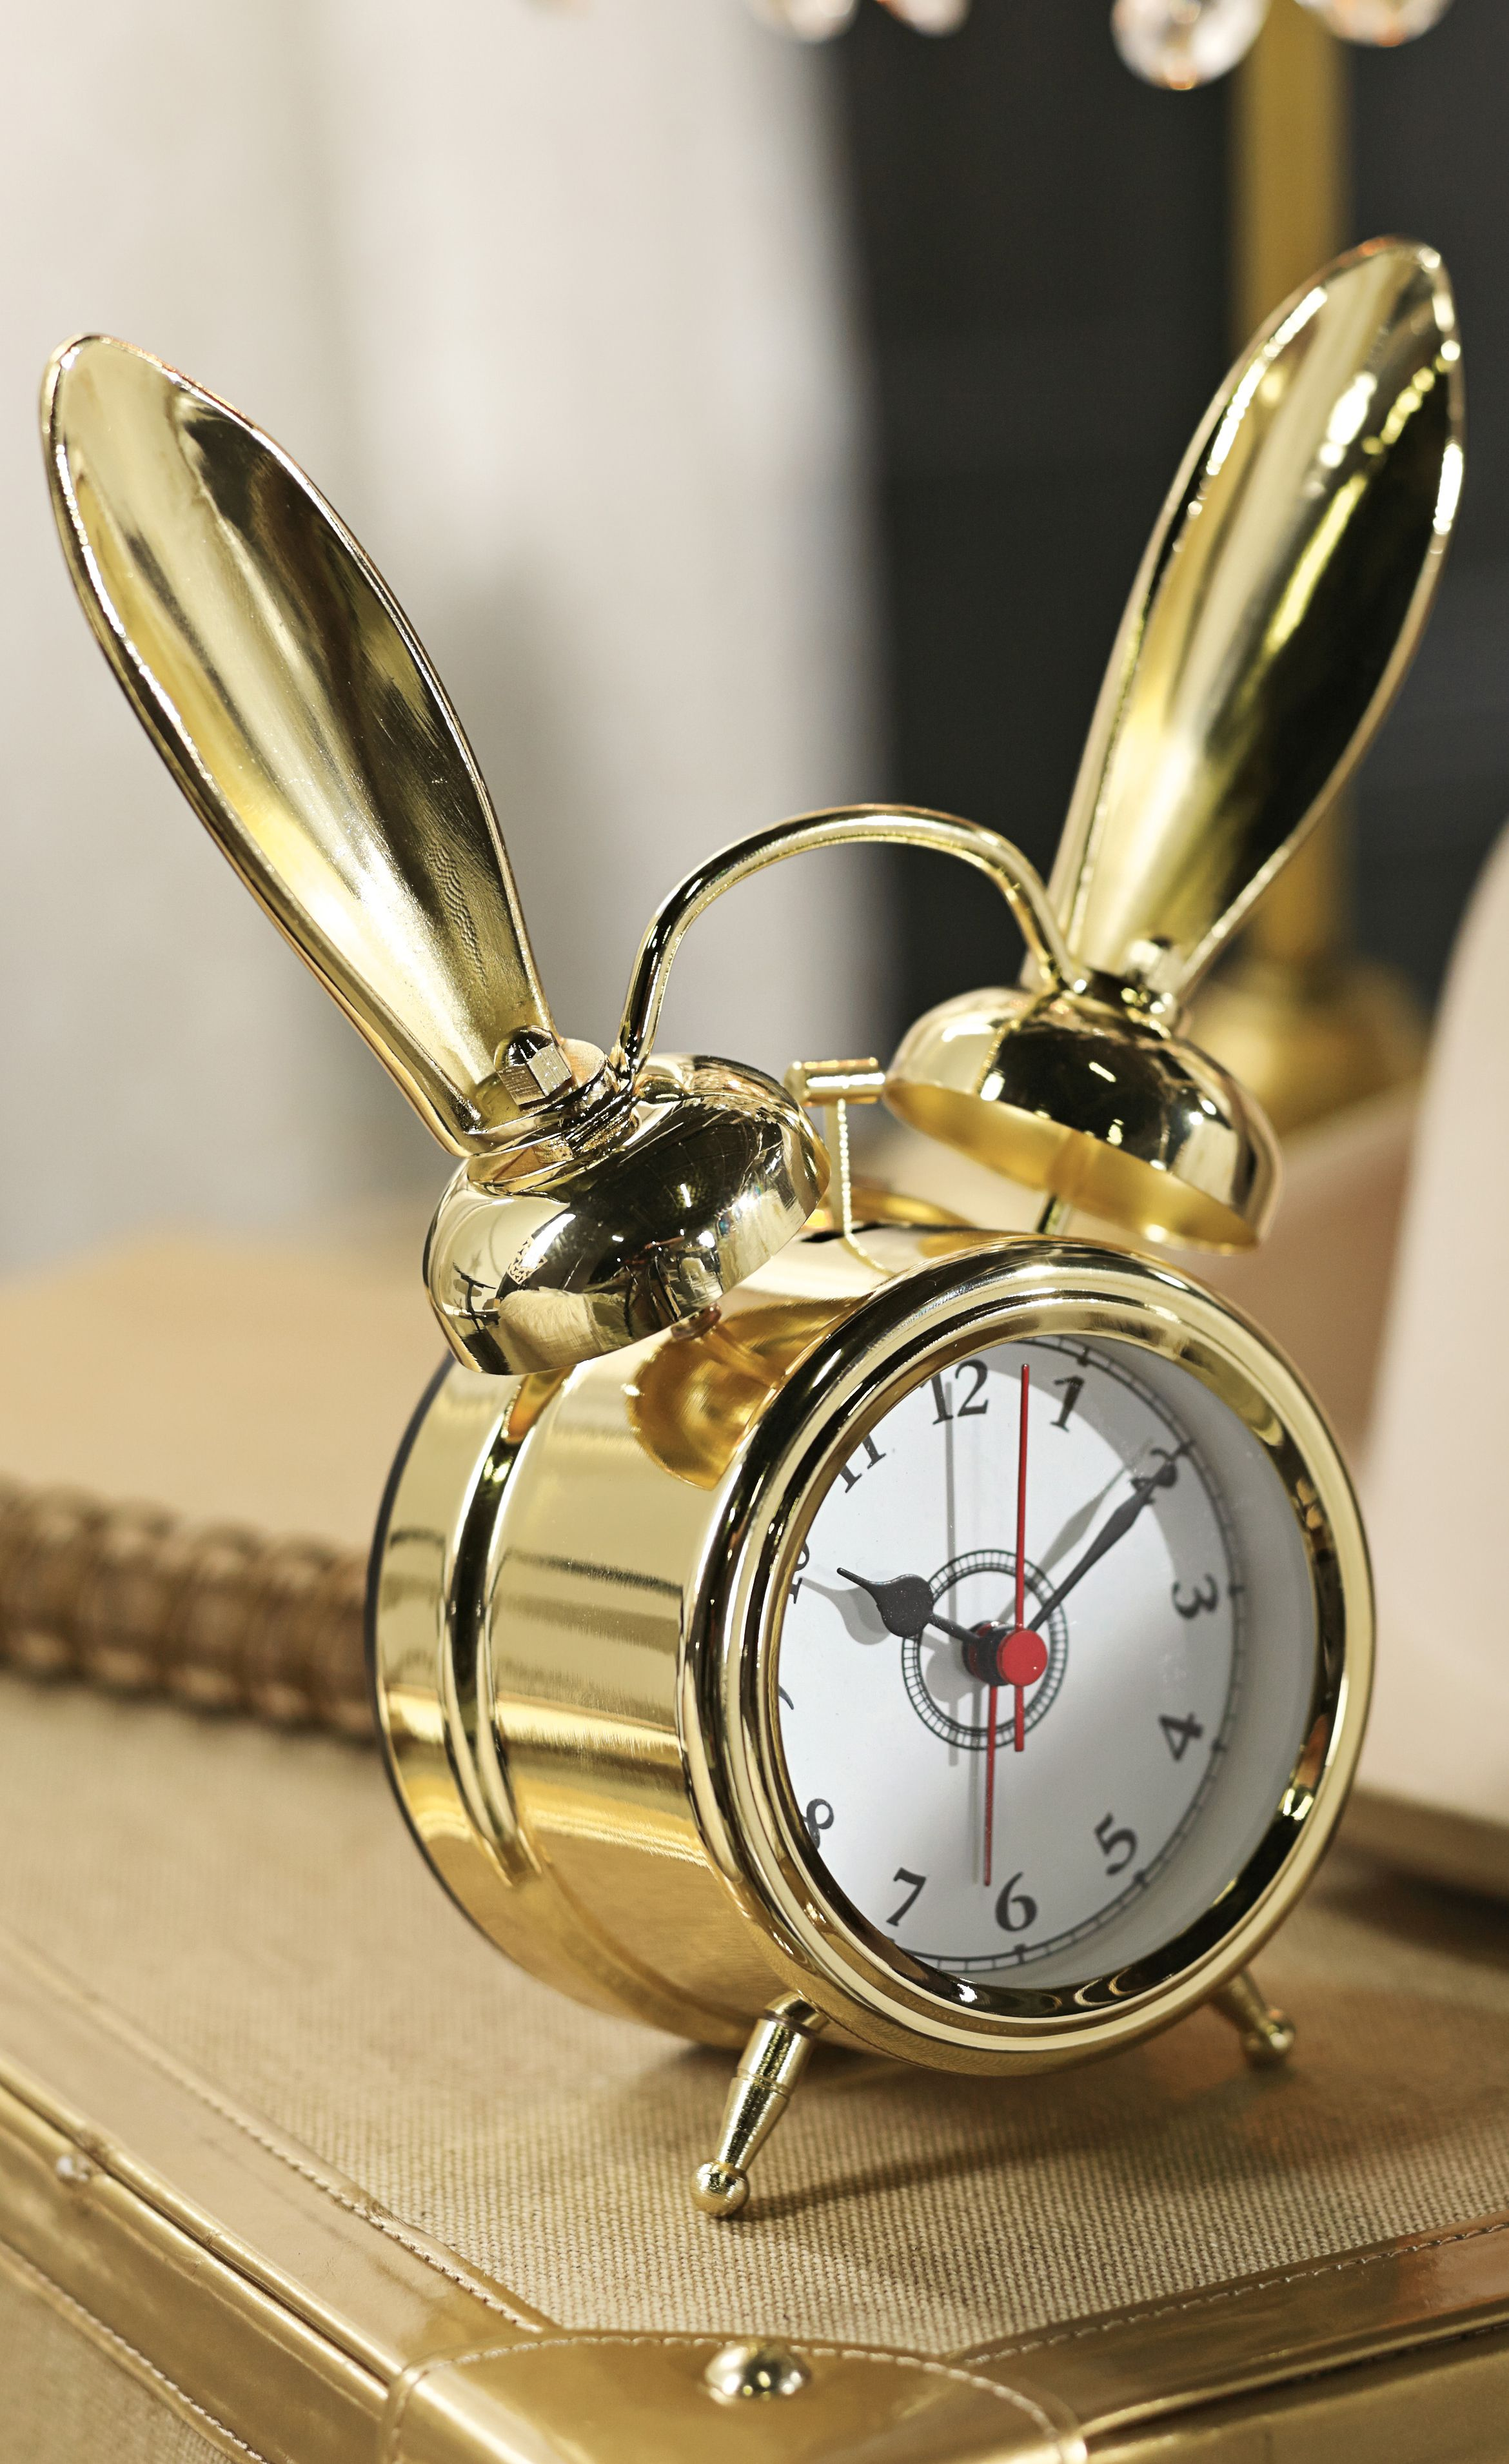 Decorative Bedroom Alarm Clocks: The Emily & Meritt Bunny Alarm Clocks